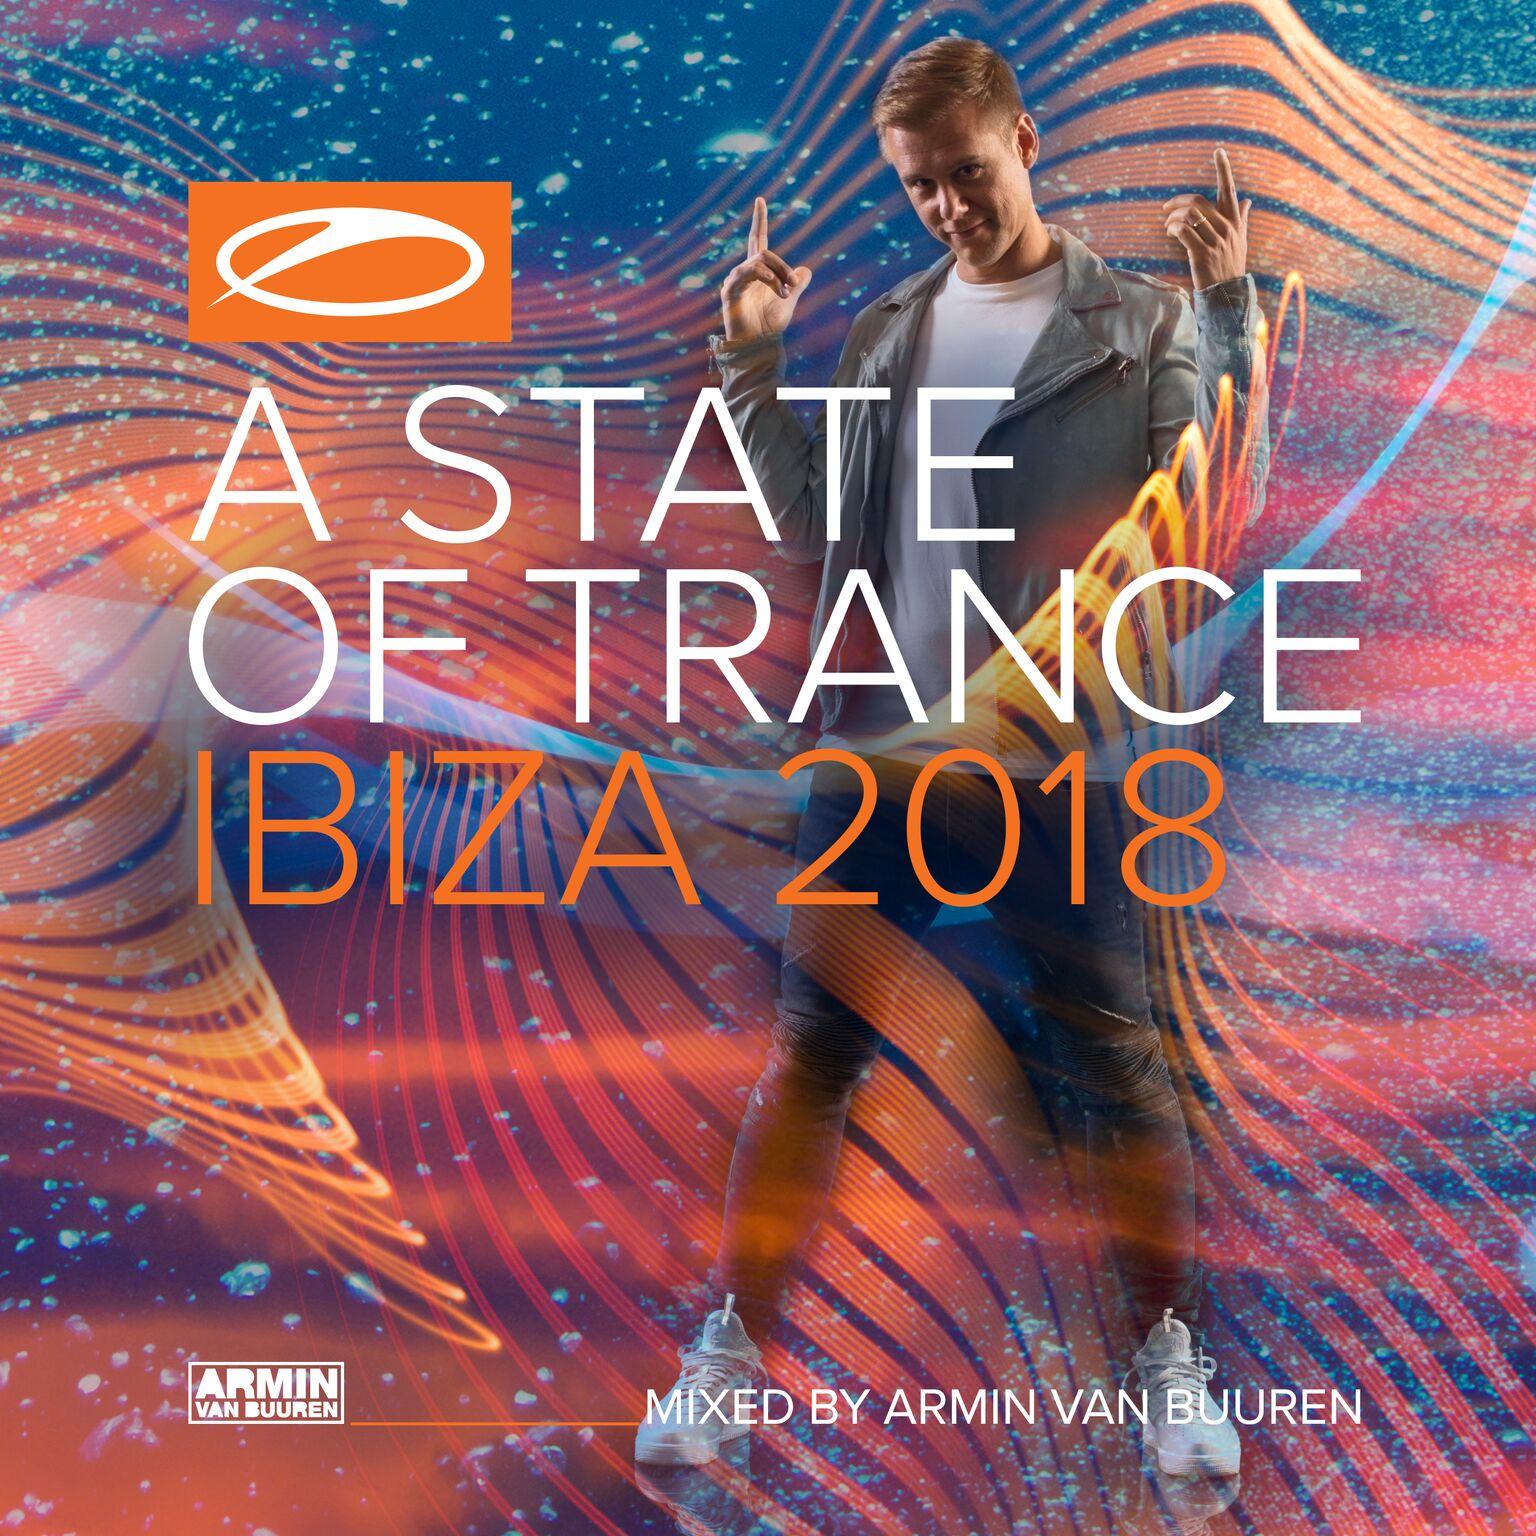 A State Of Trance, Ibiza 2018 mixed by Armin van Buuren